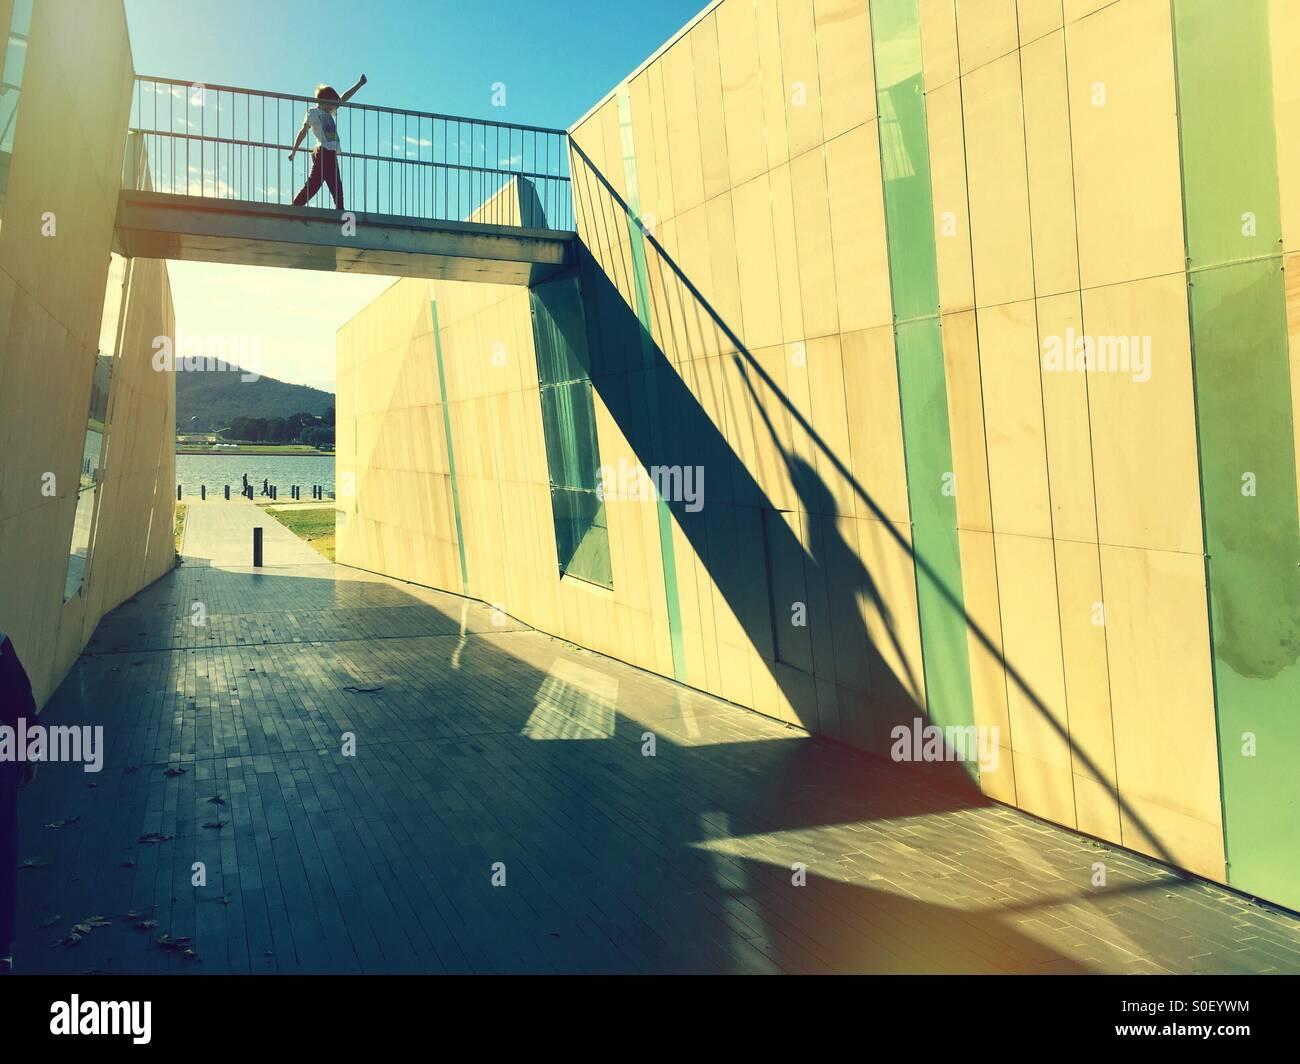 A boy striding across a bridge over an underpass Stock Photo